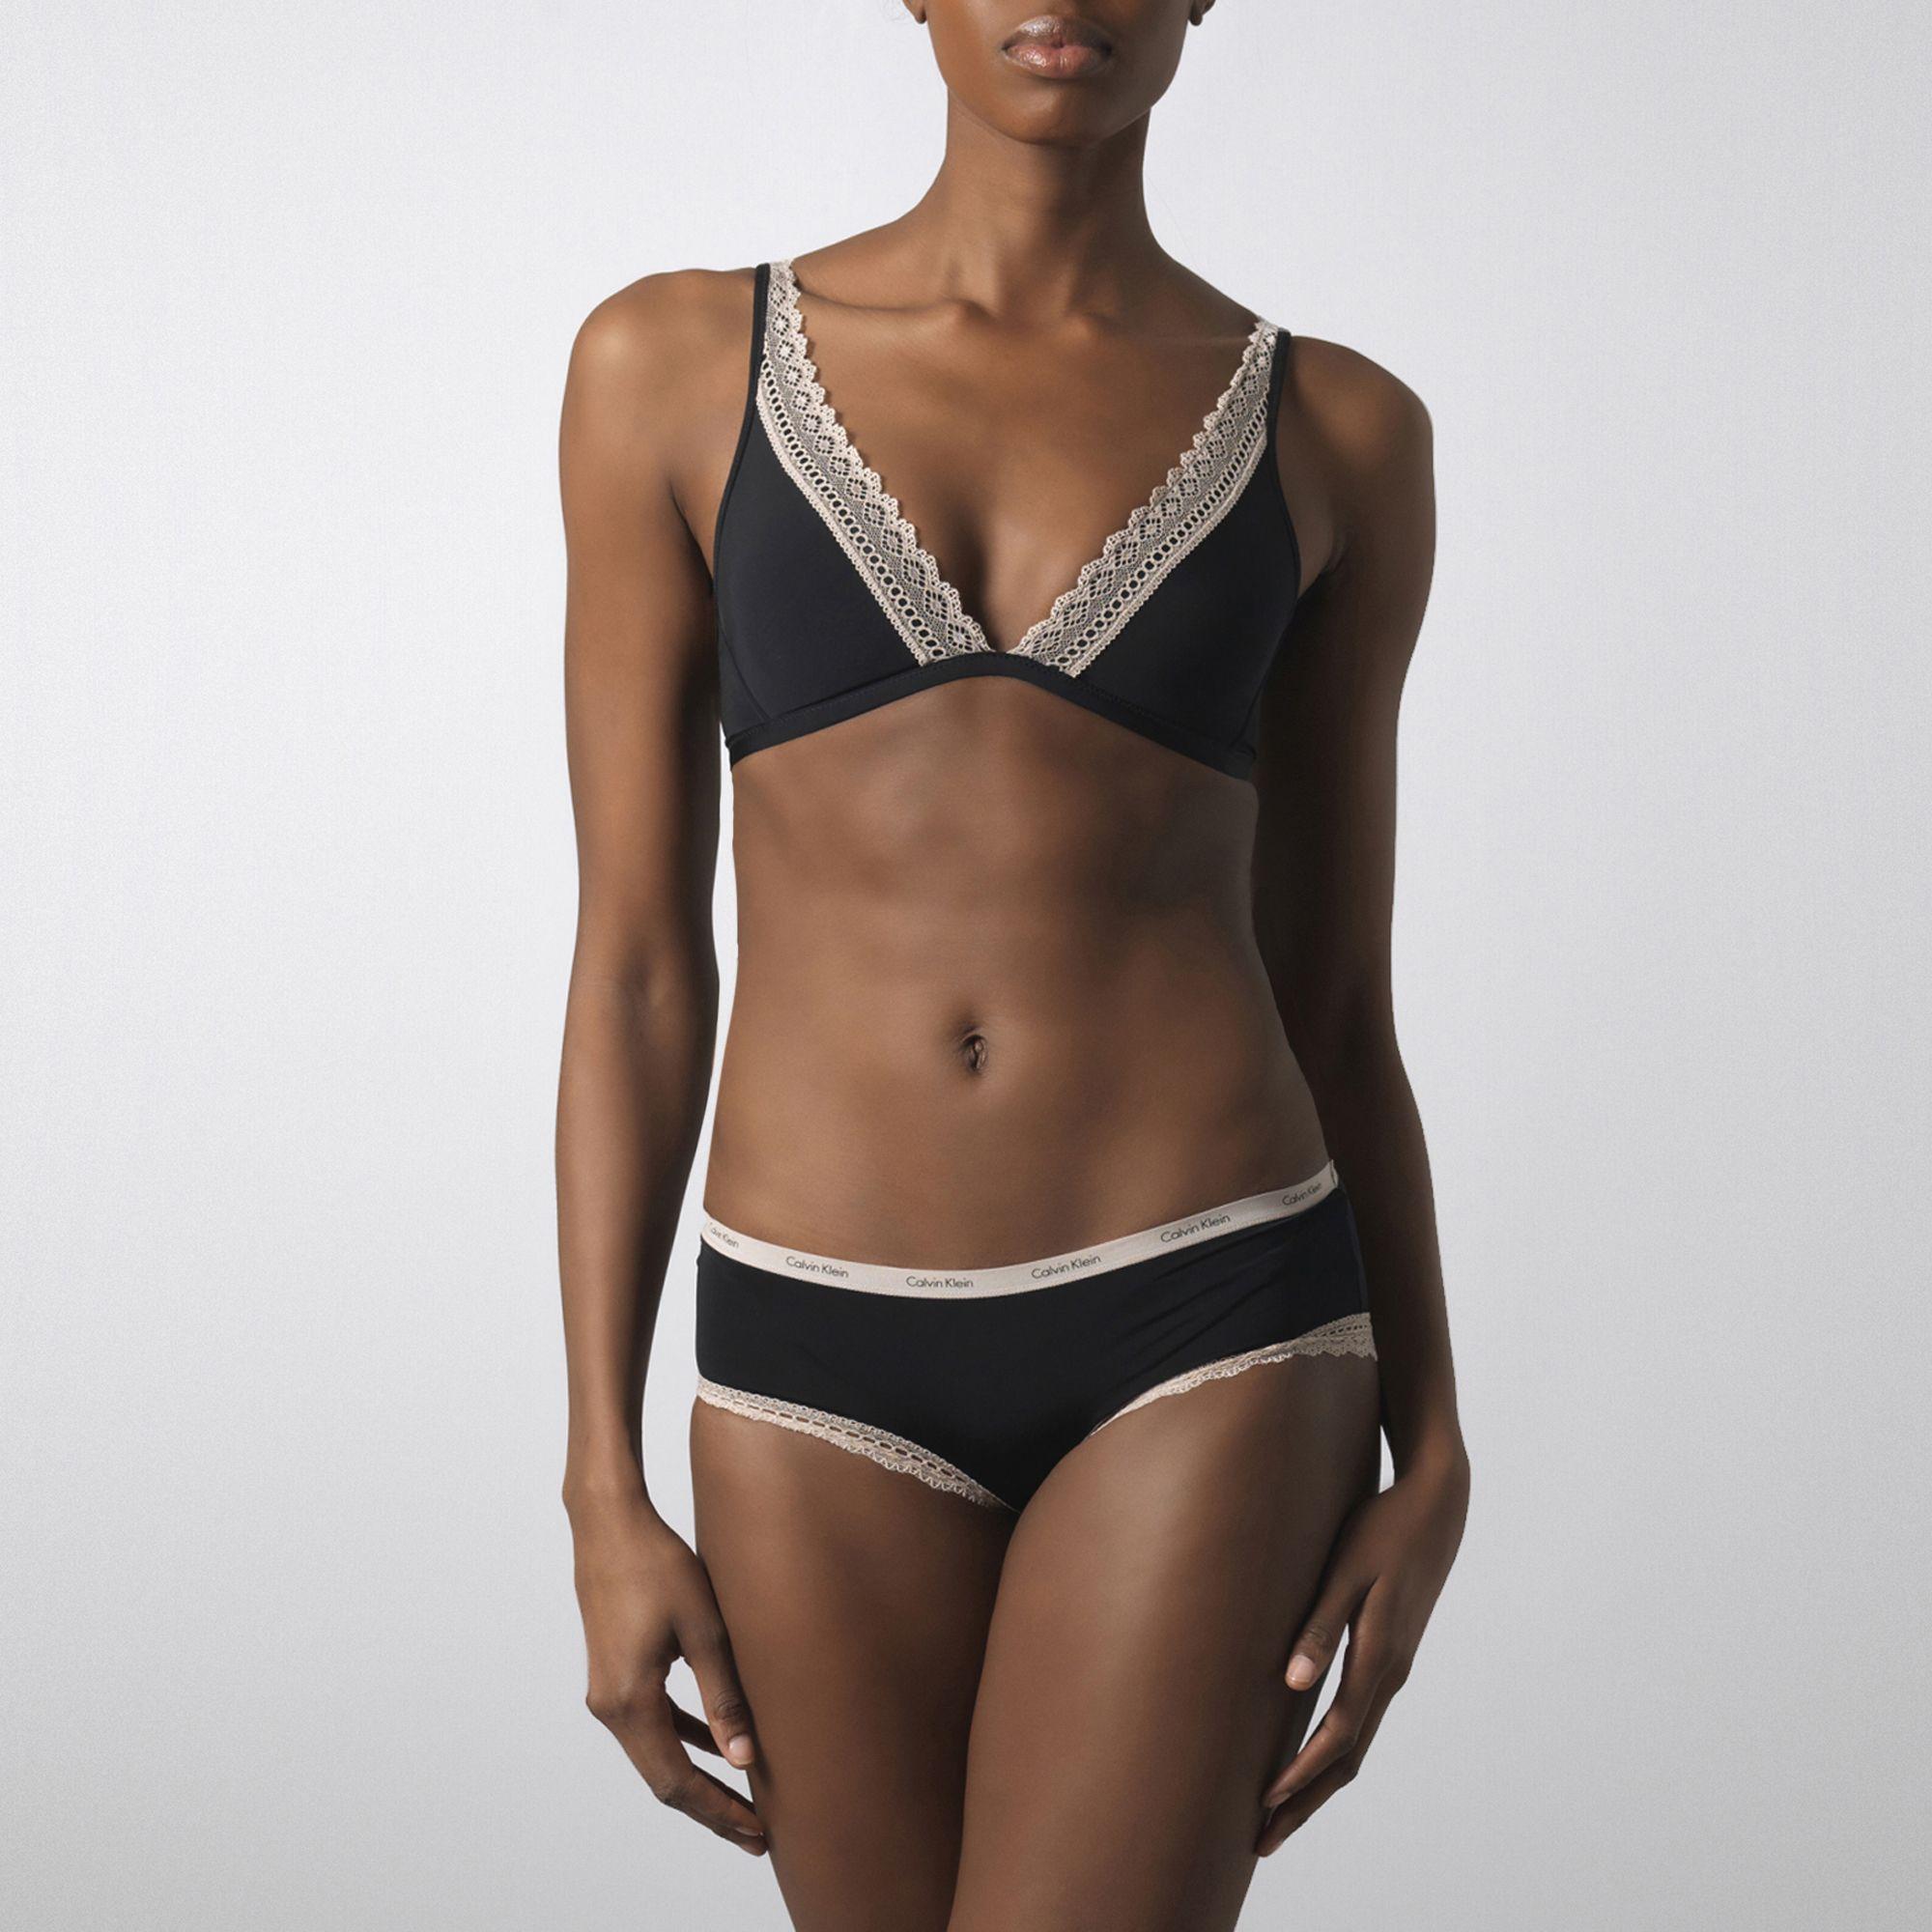 854dd0cc3b0d5 Calvin Klein Perfect Fit Flirty Wireless Contour Bra in Black - Lyst